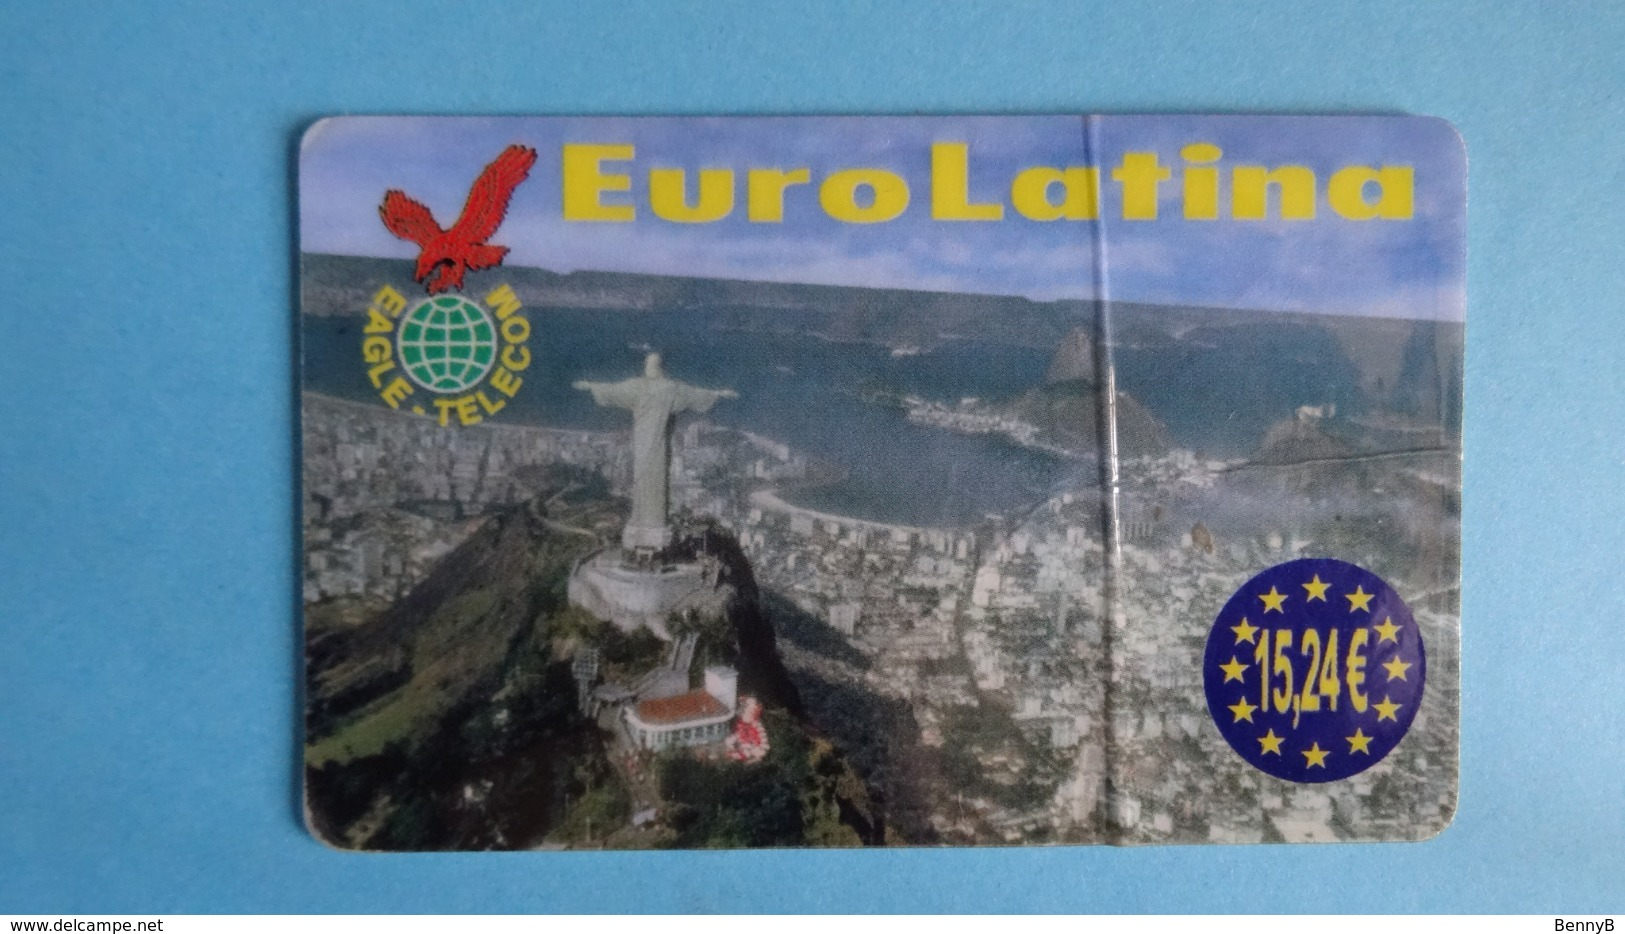 FRANCE CARTE PREPAYEE EAGLE/ EUROLATINA  - 15,24€ - VALIDITE 31/10/2006 Mauvais état (pliée) Voir Scan - Frankrijk